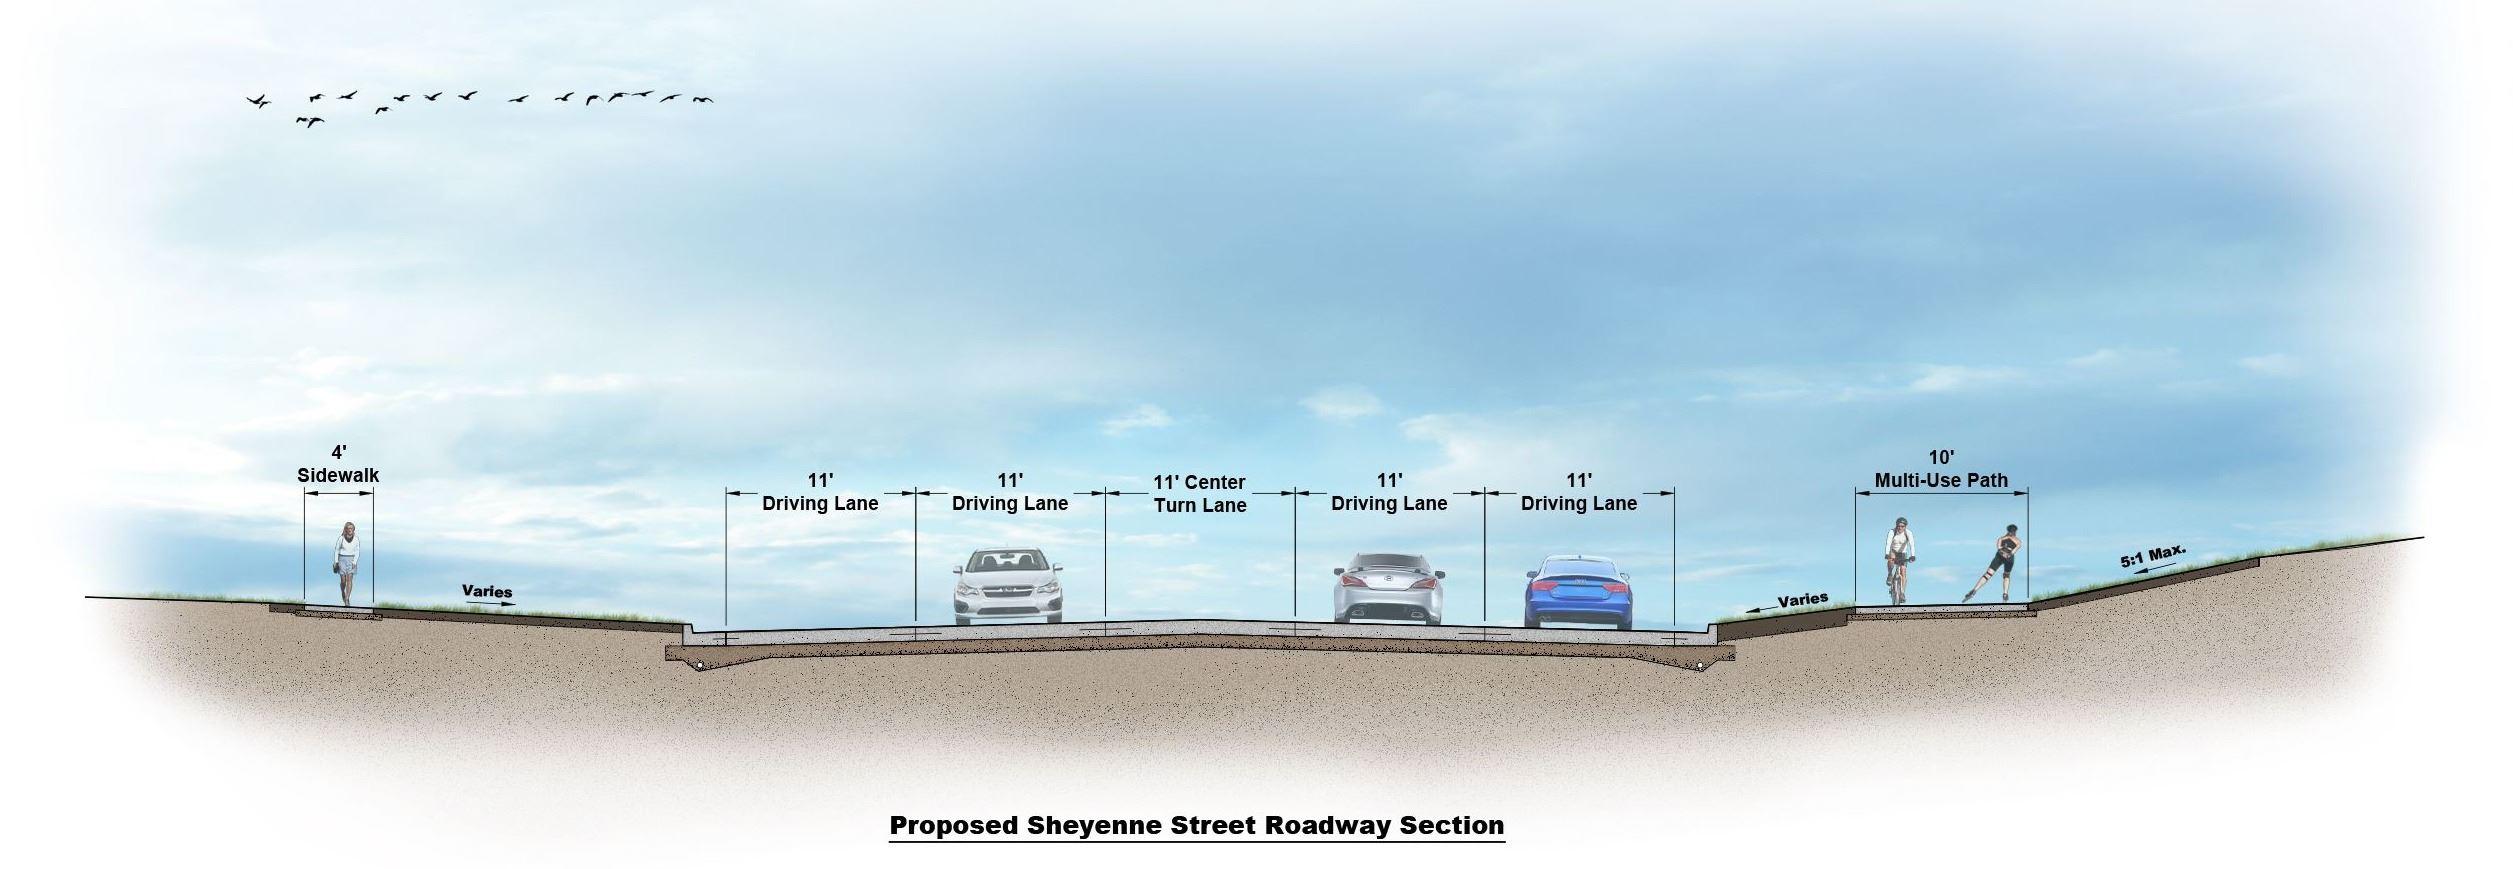 Sheyenne Street Segment 1 - 13th Ave  to Beaton Dr | West Fargo, ND